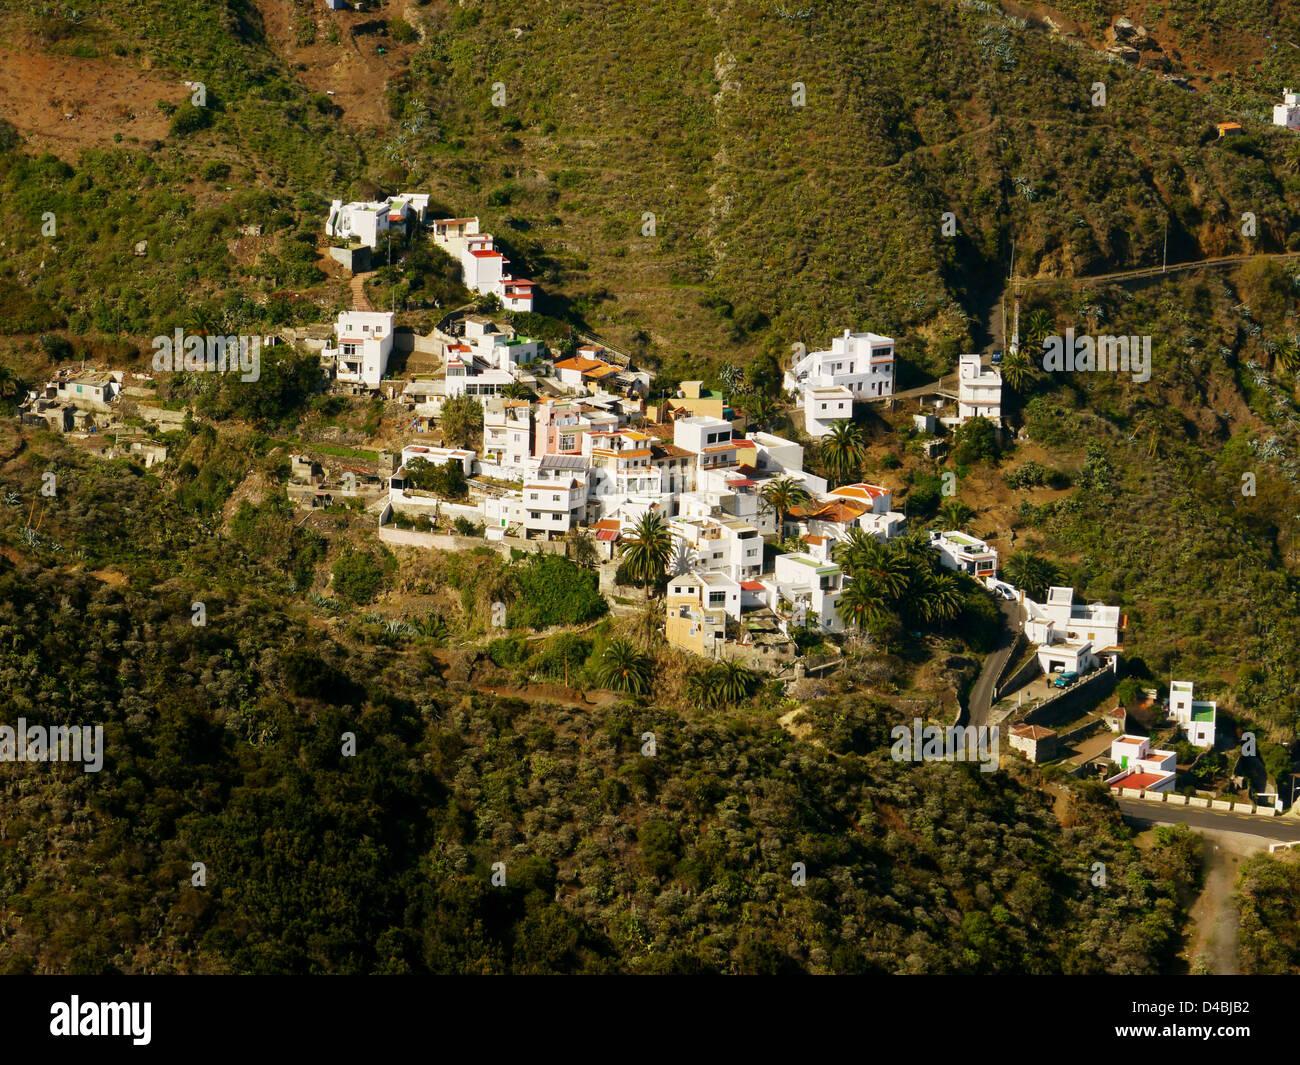 Village of Taganana, Tenerife, Canary Islands, Spain - Stock Image